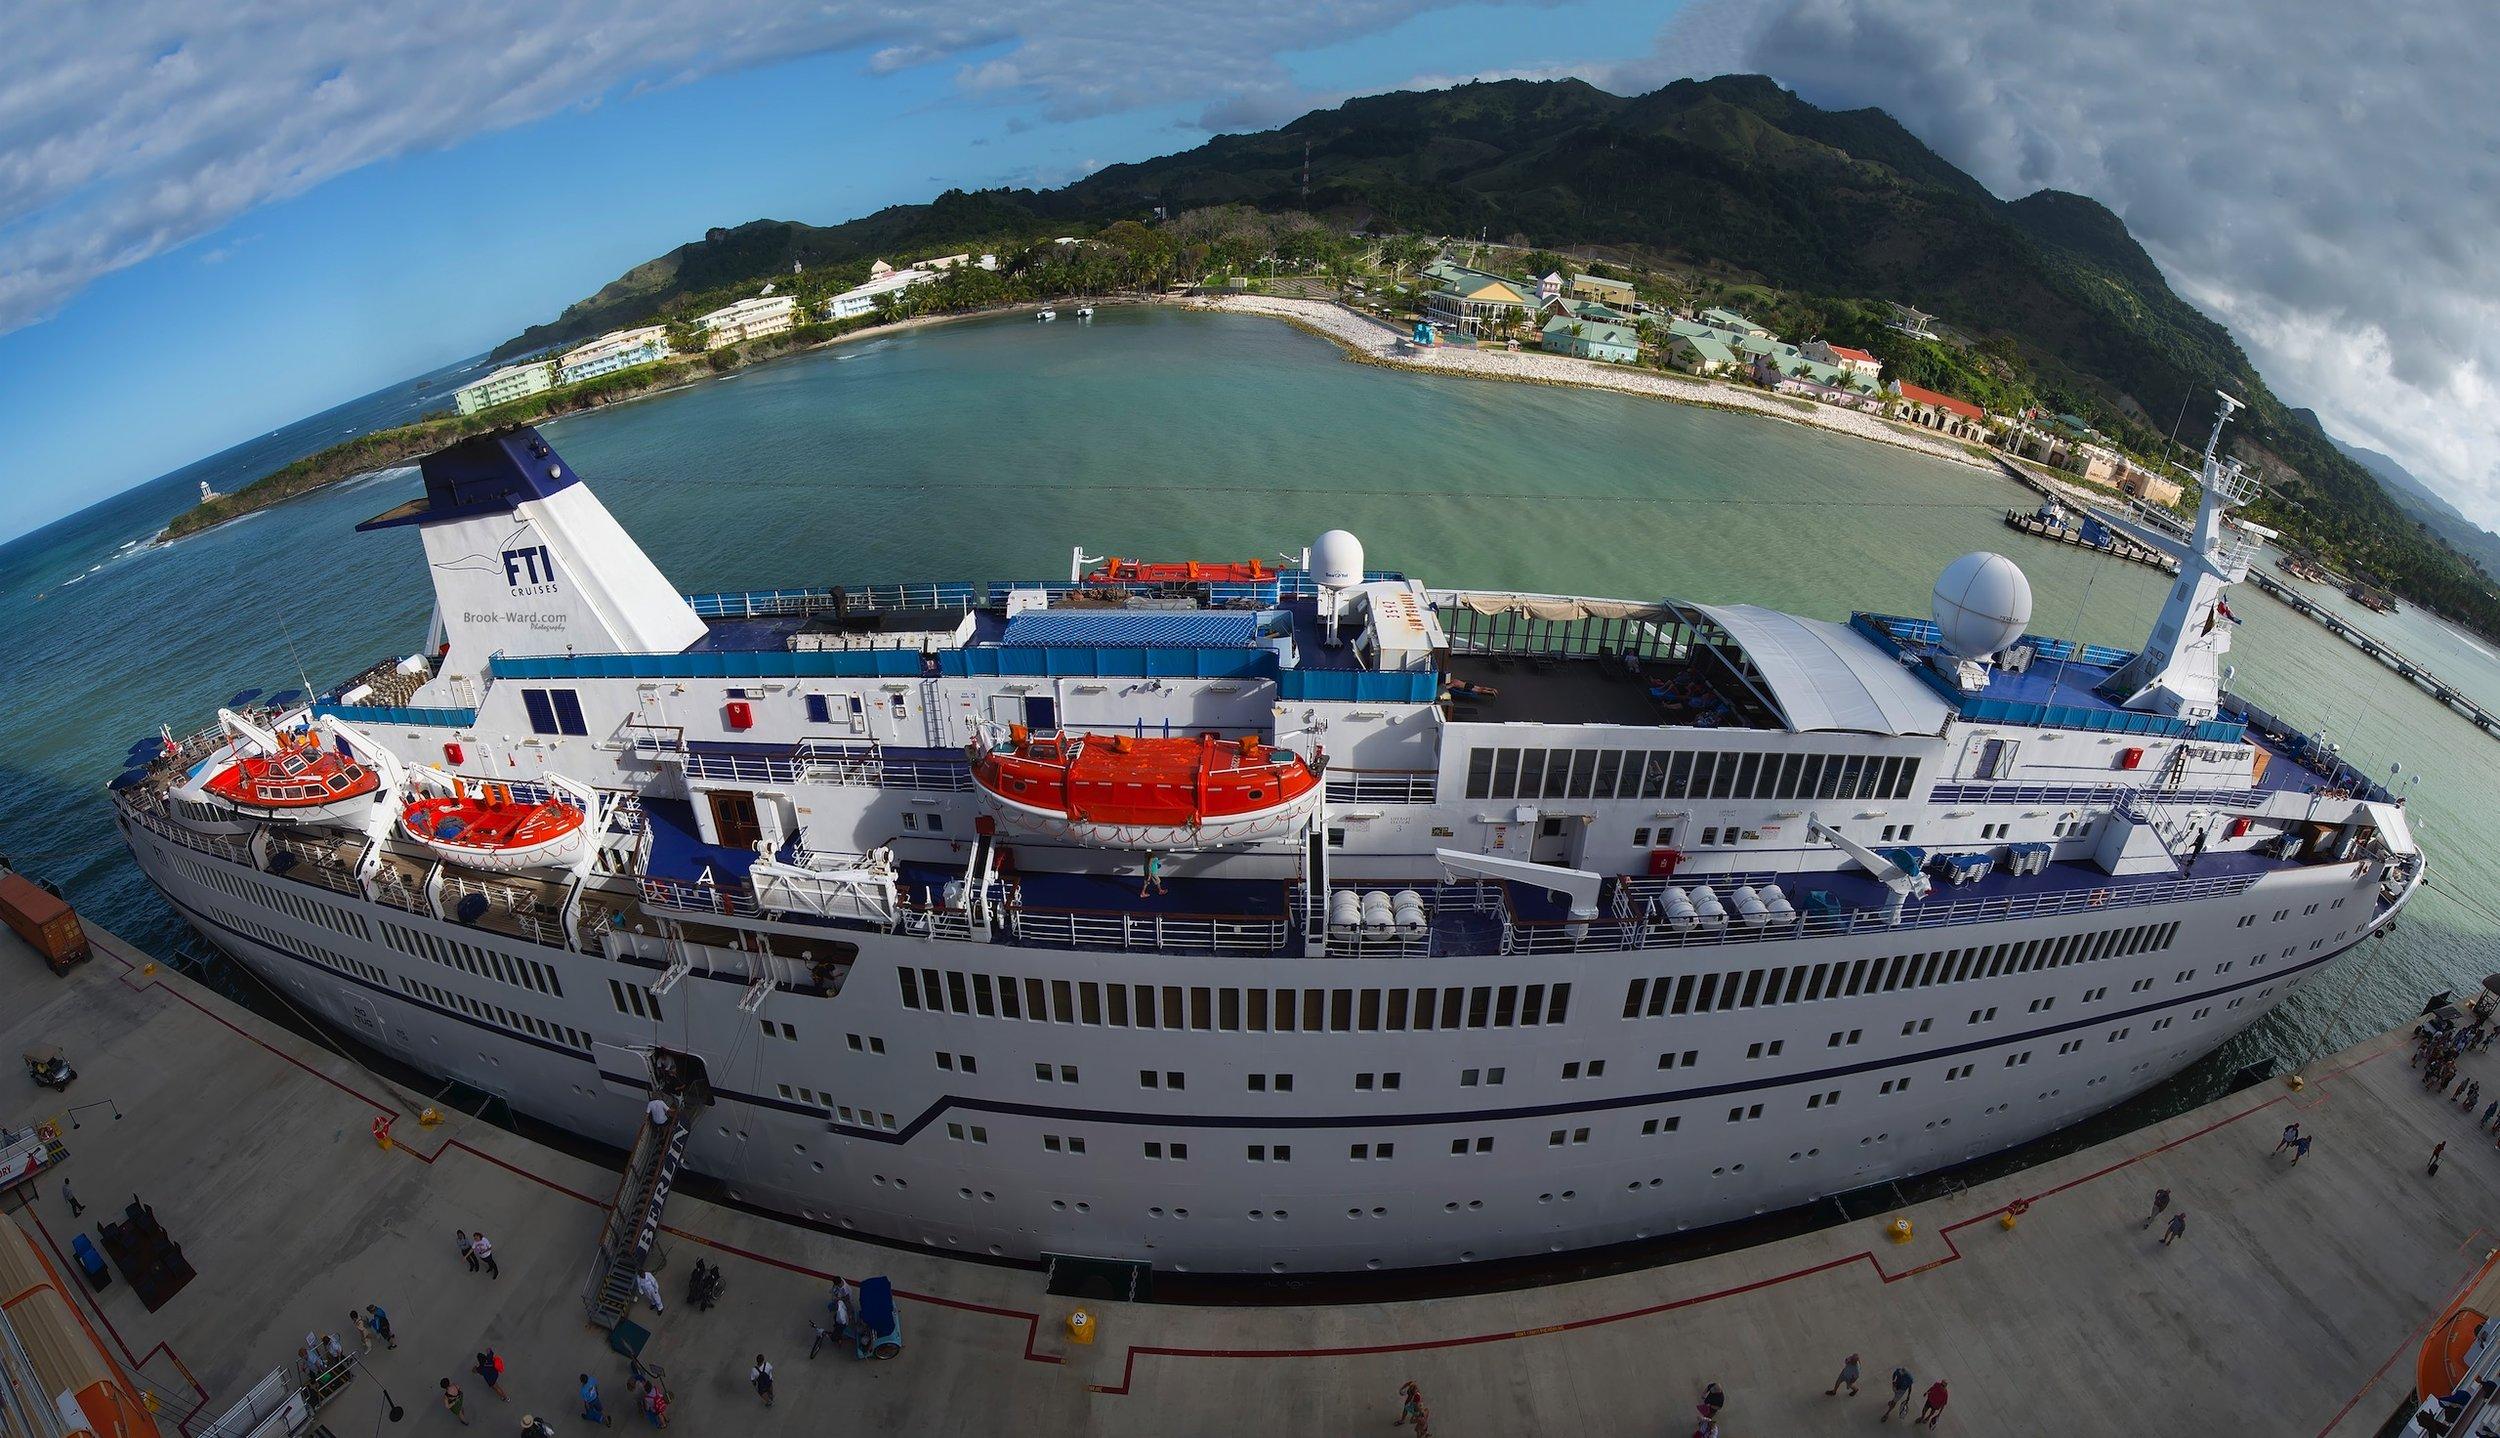 FTI Berlin Cruise Ship